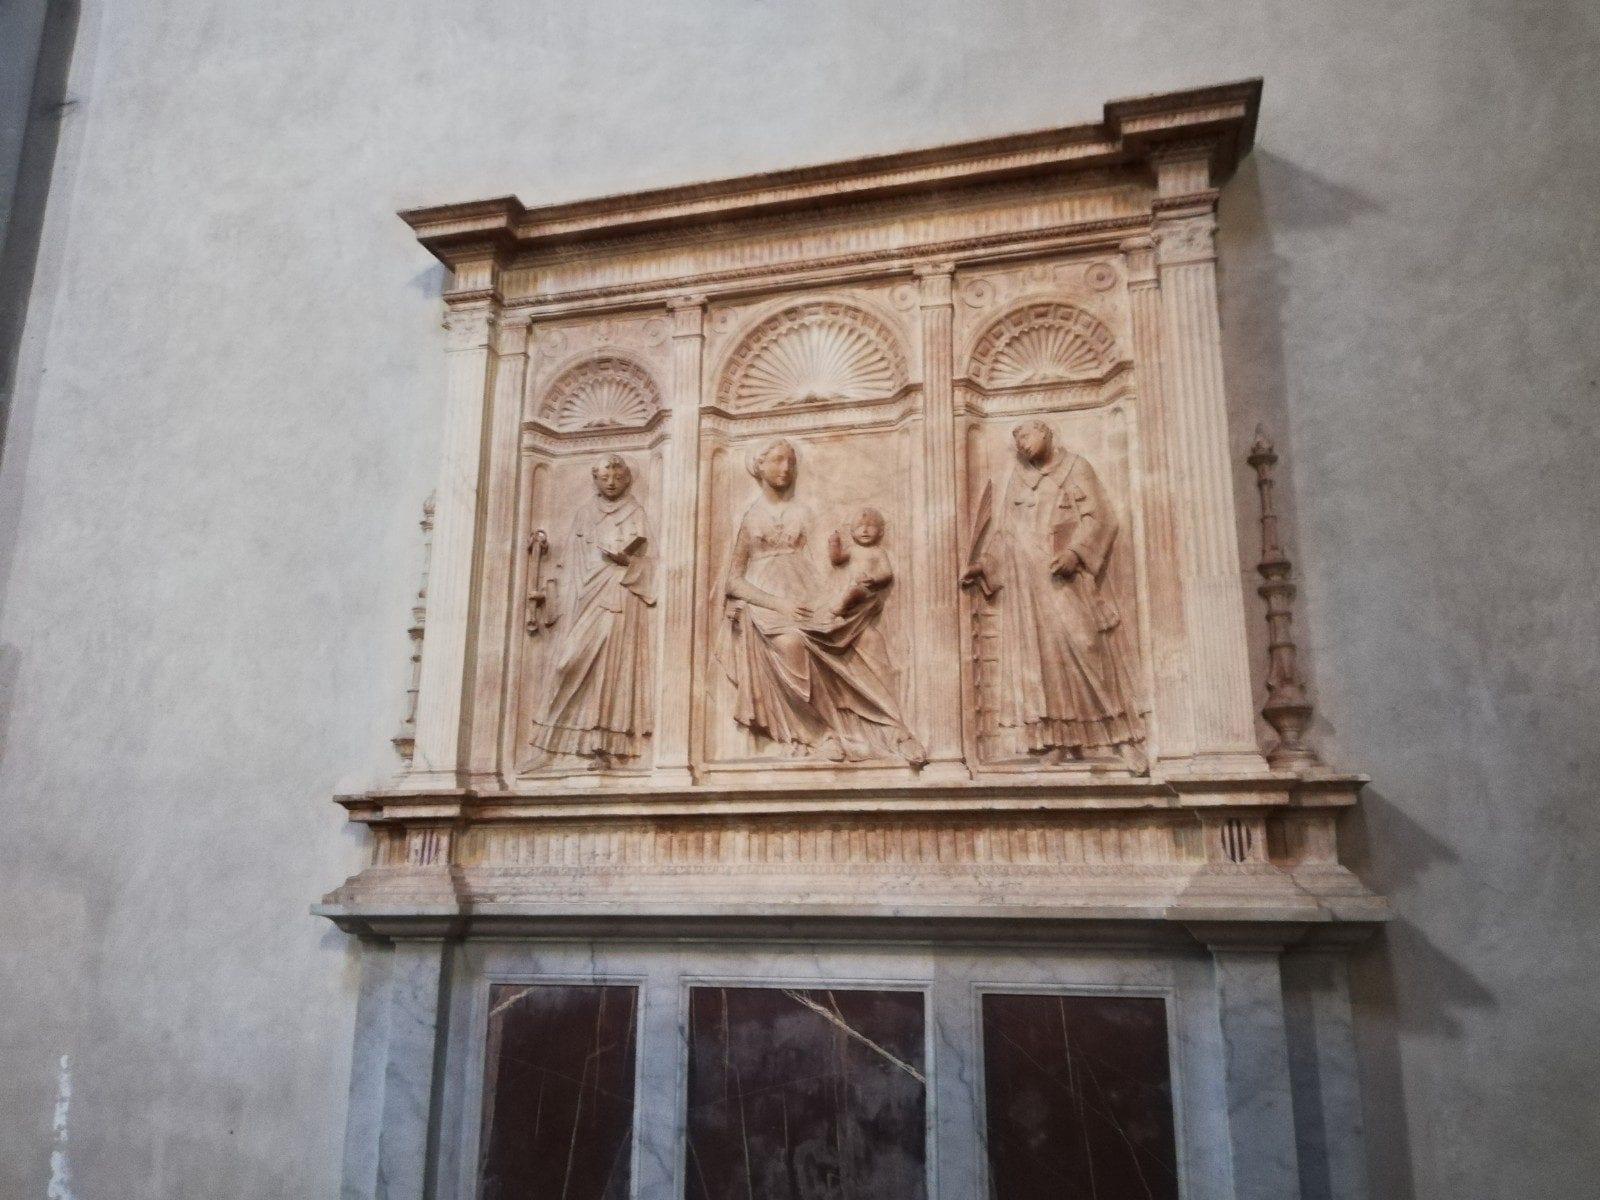 Mino da Fiesole, Dossale Neroni